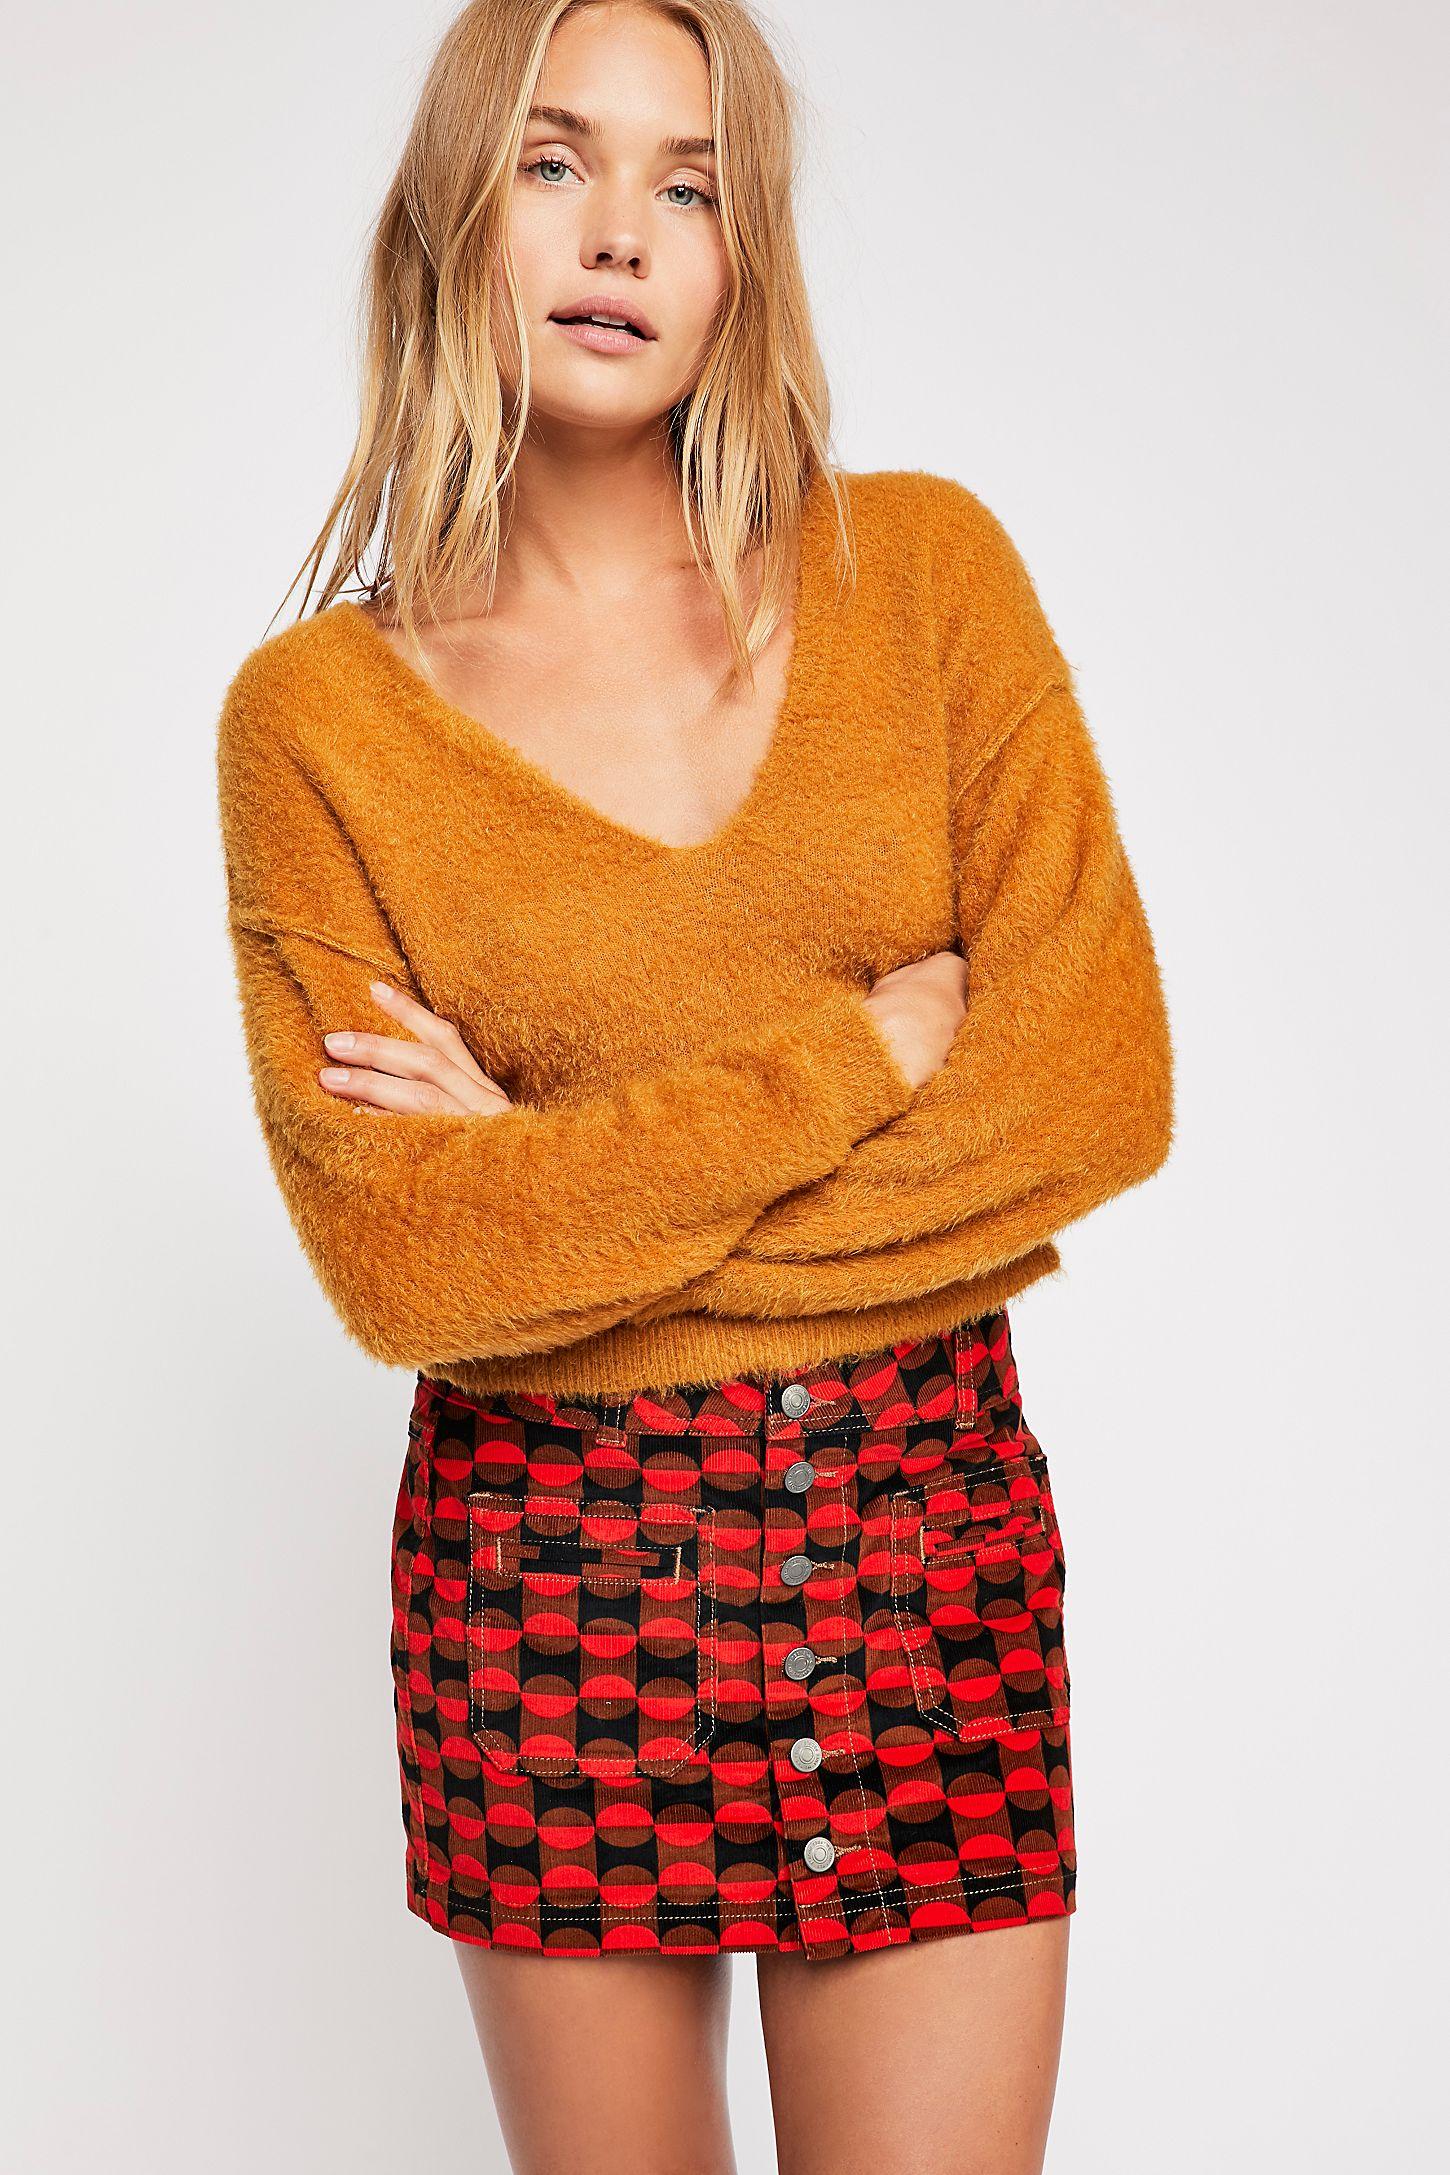 7a7656f33d Joanie Printed Cord Skirt | Free People UK